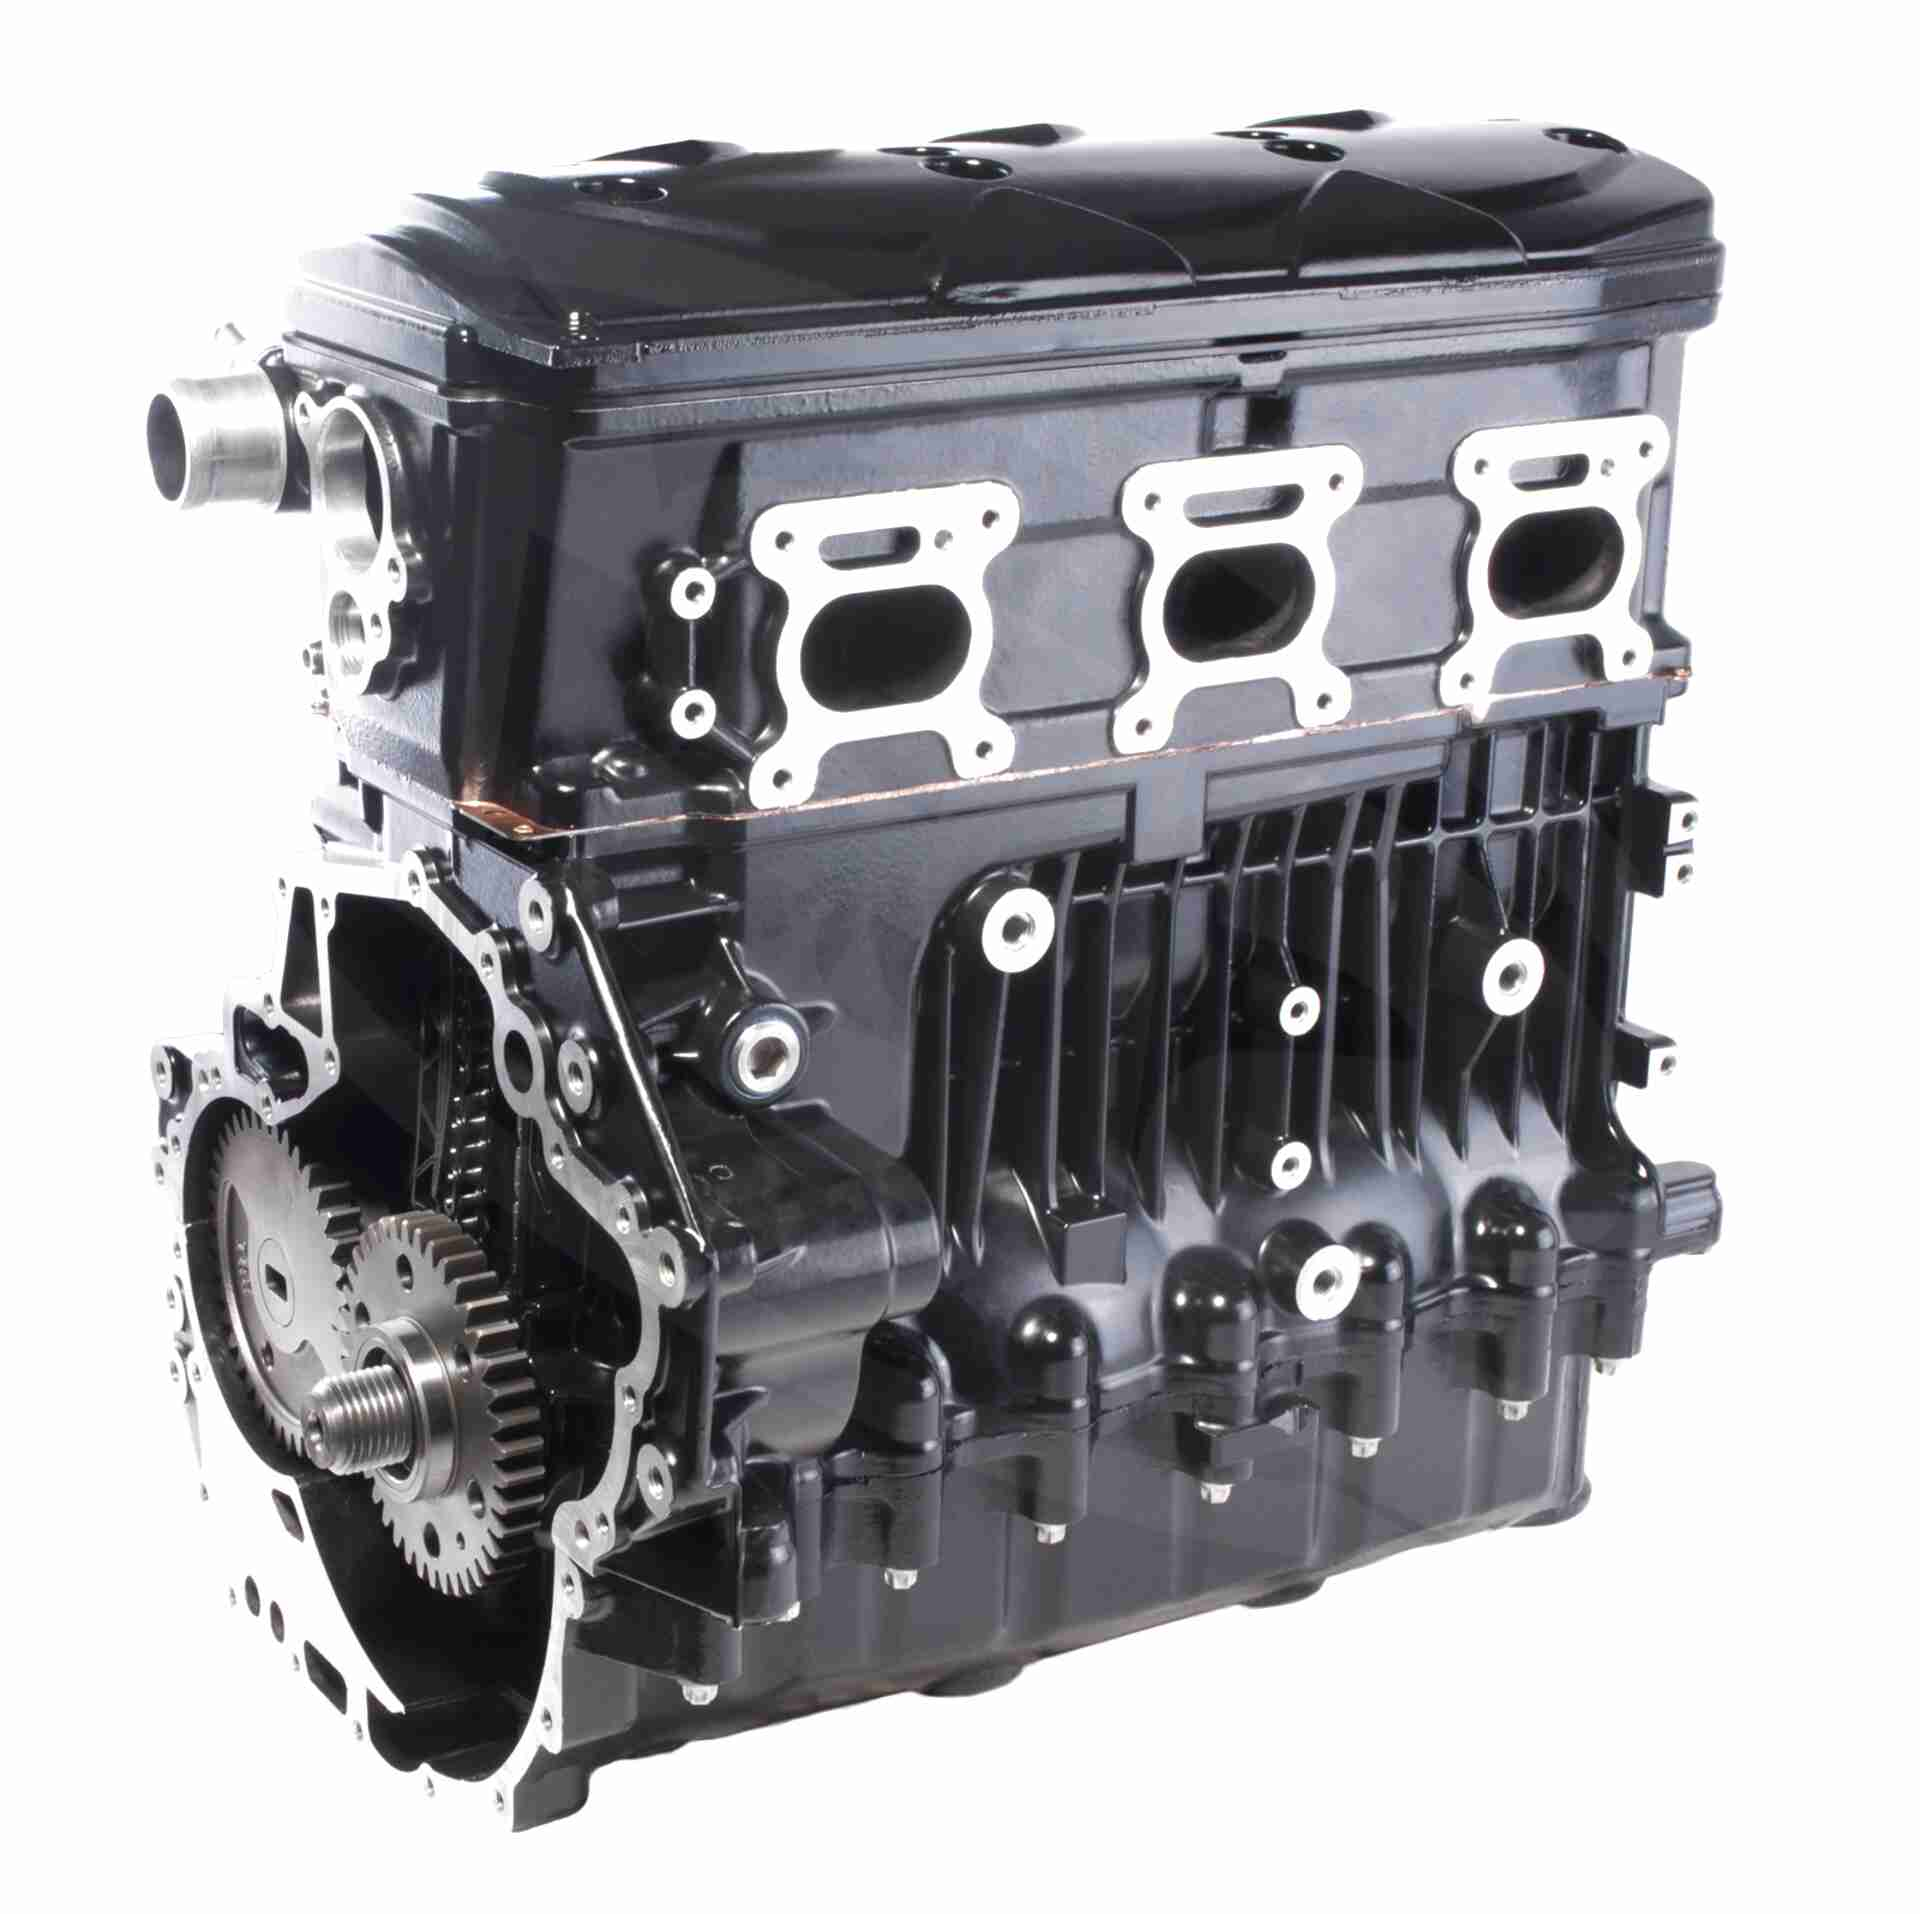 Sea Doo Engine For Sale